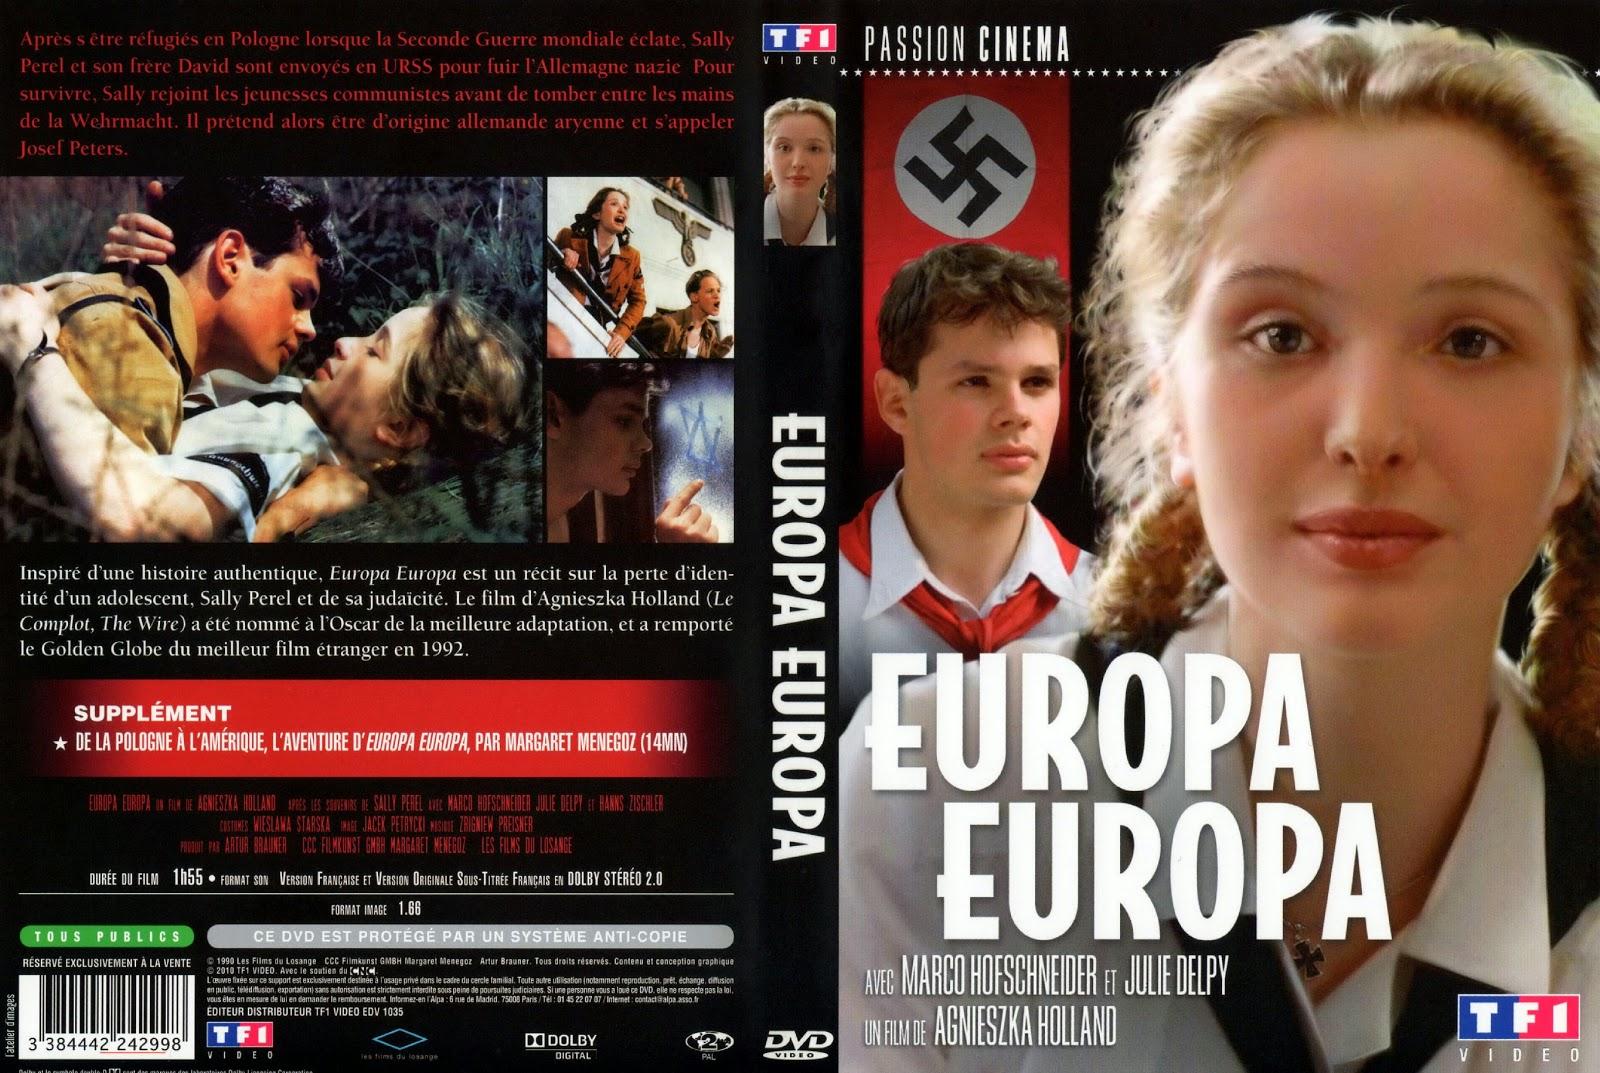 Europa  Europa (1999 - Hitlerjunge Salomon)